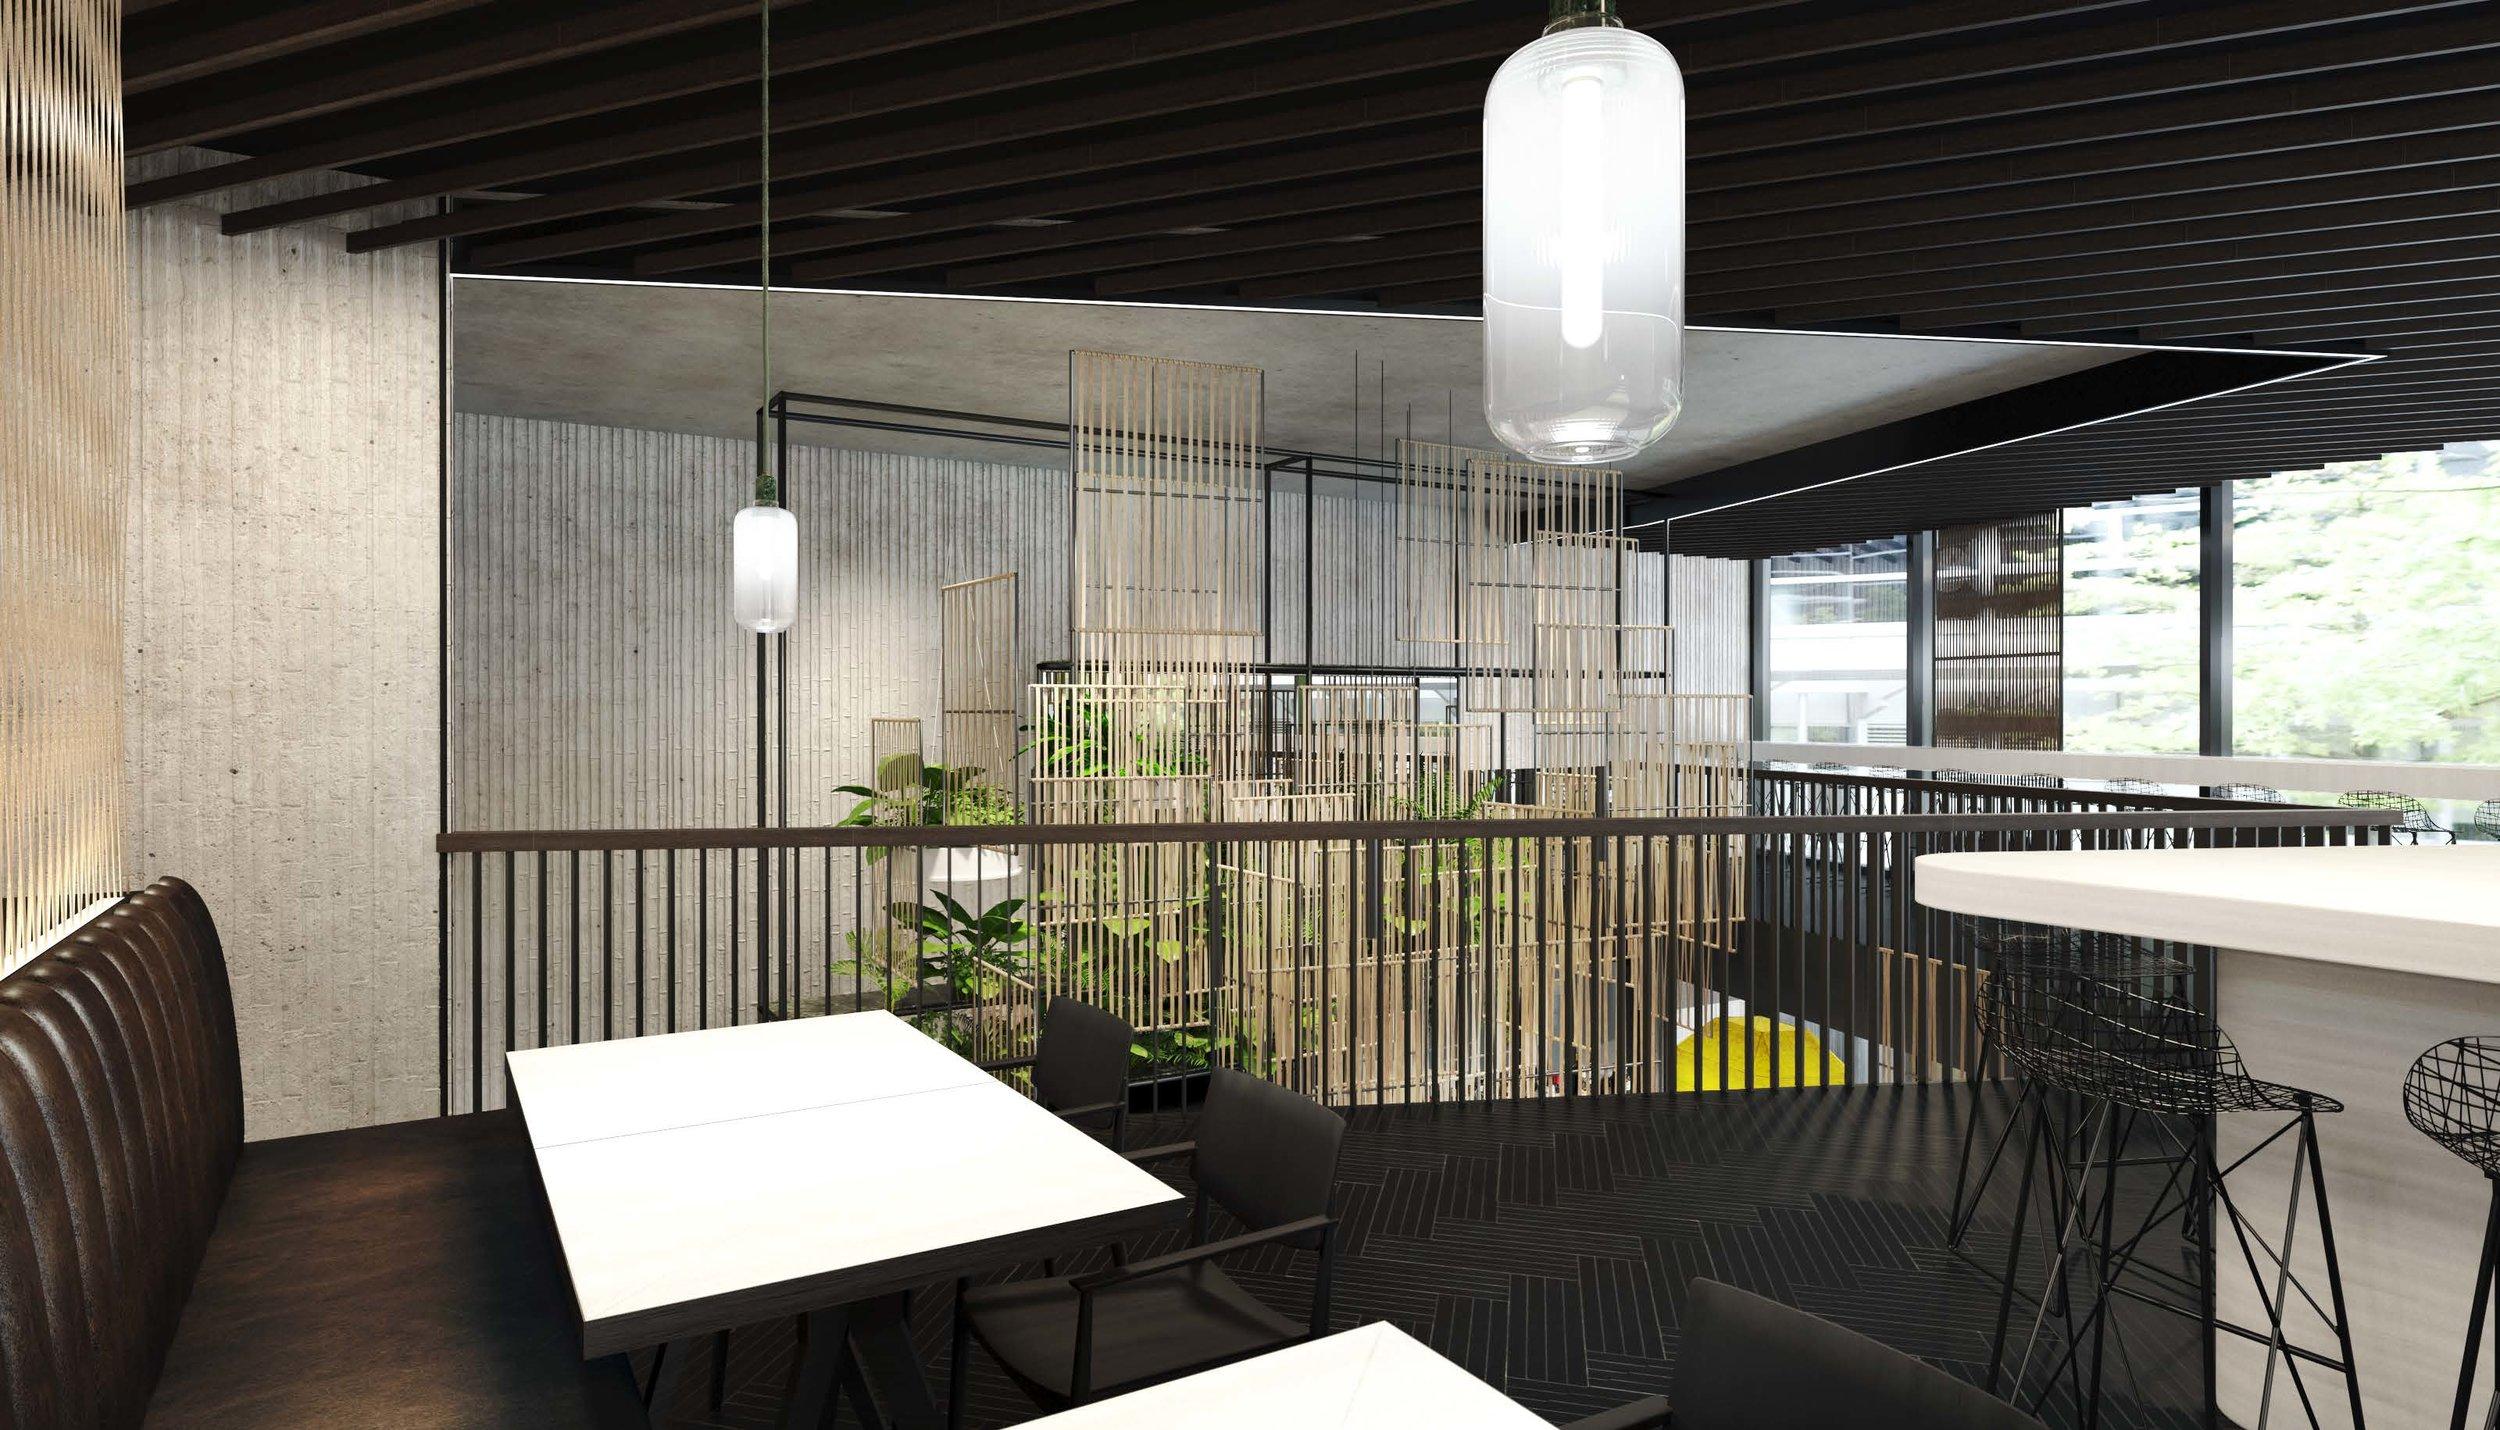 Königstraße, Stuttgart, restaurant, hospitality, asian food, rendering, visualization, Studio Alexander Fehre